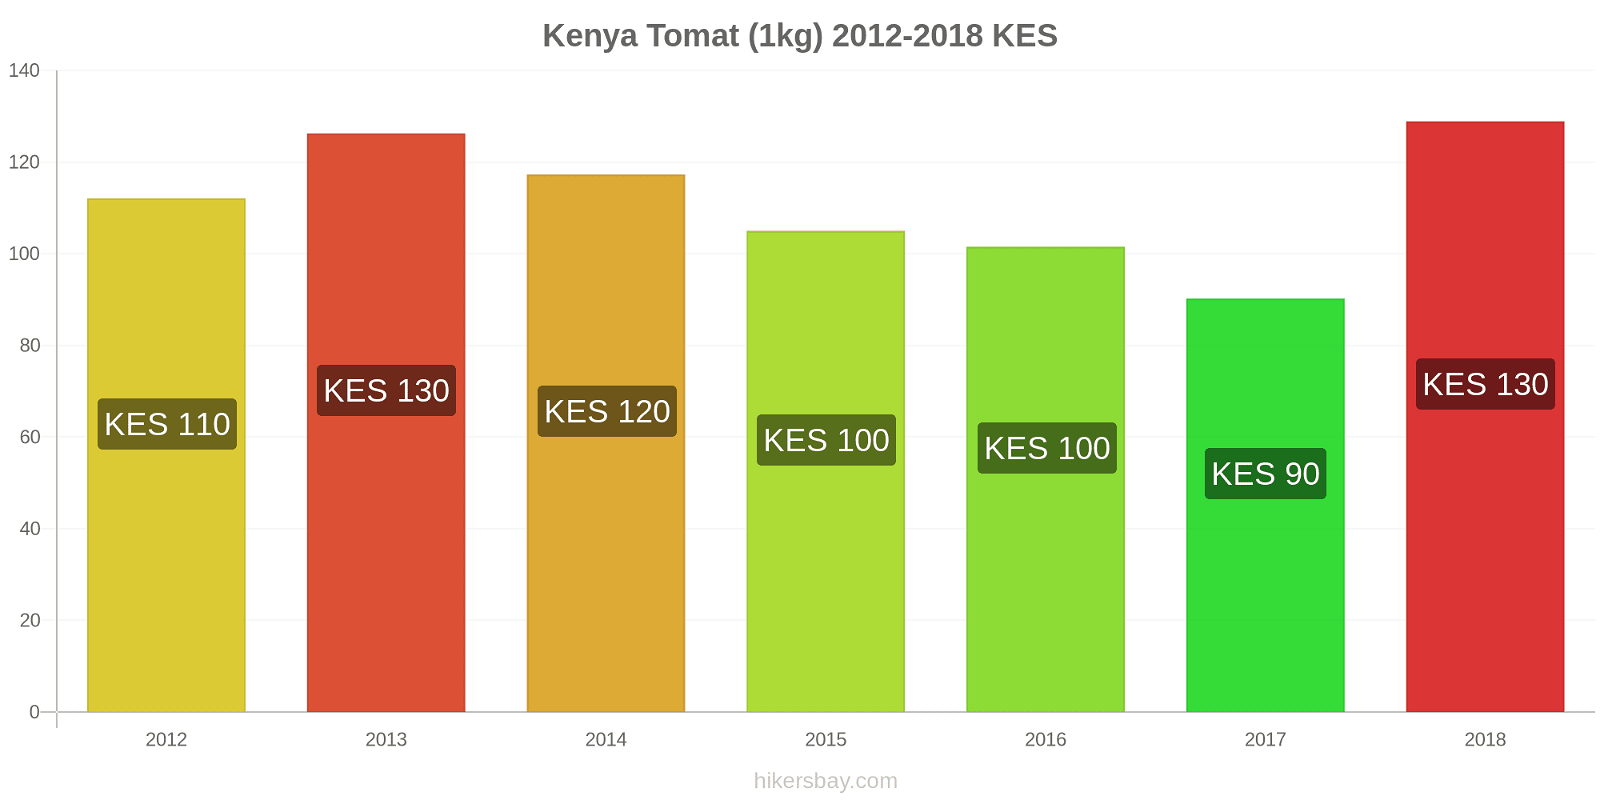 Kenya prisendringer Tomat (1kg) hikersbay.com